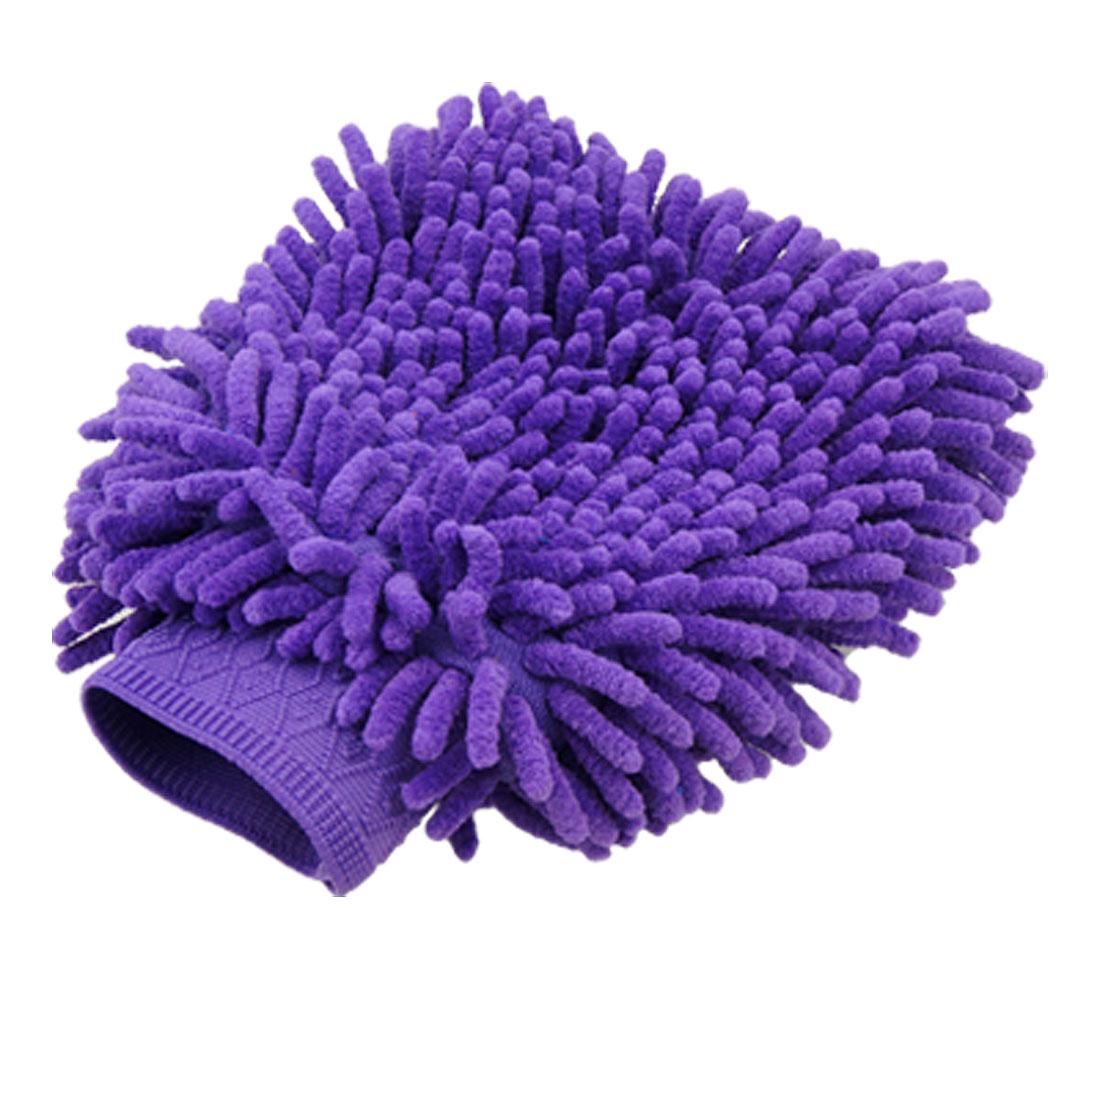 Coral Shape Elastic Cuff Purple Wash Glove Mitt for Auto Car